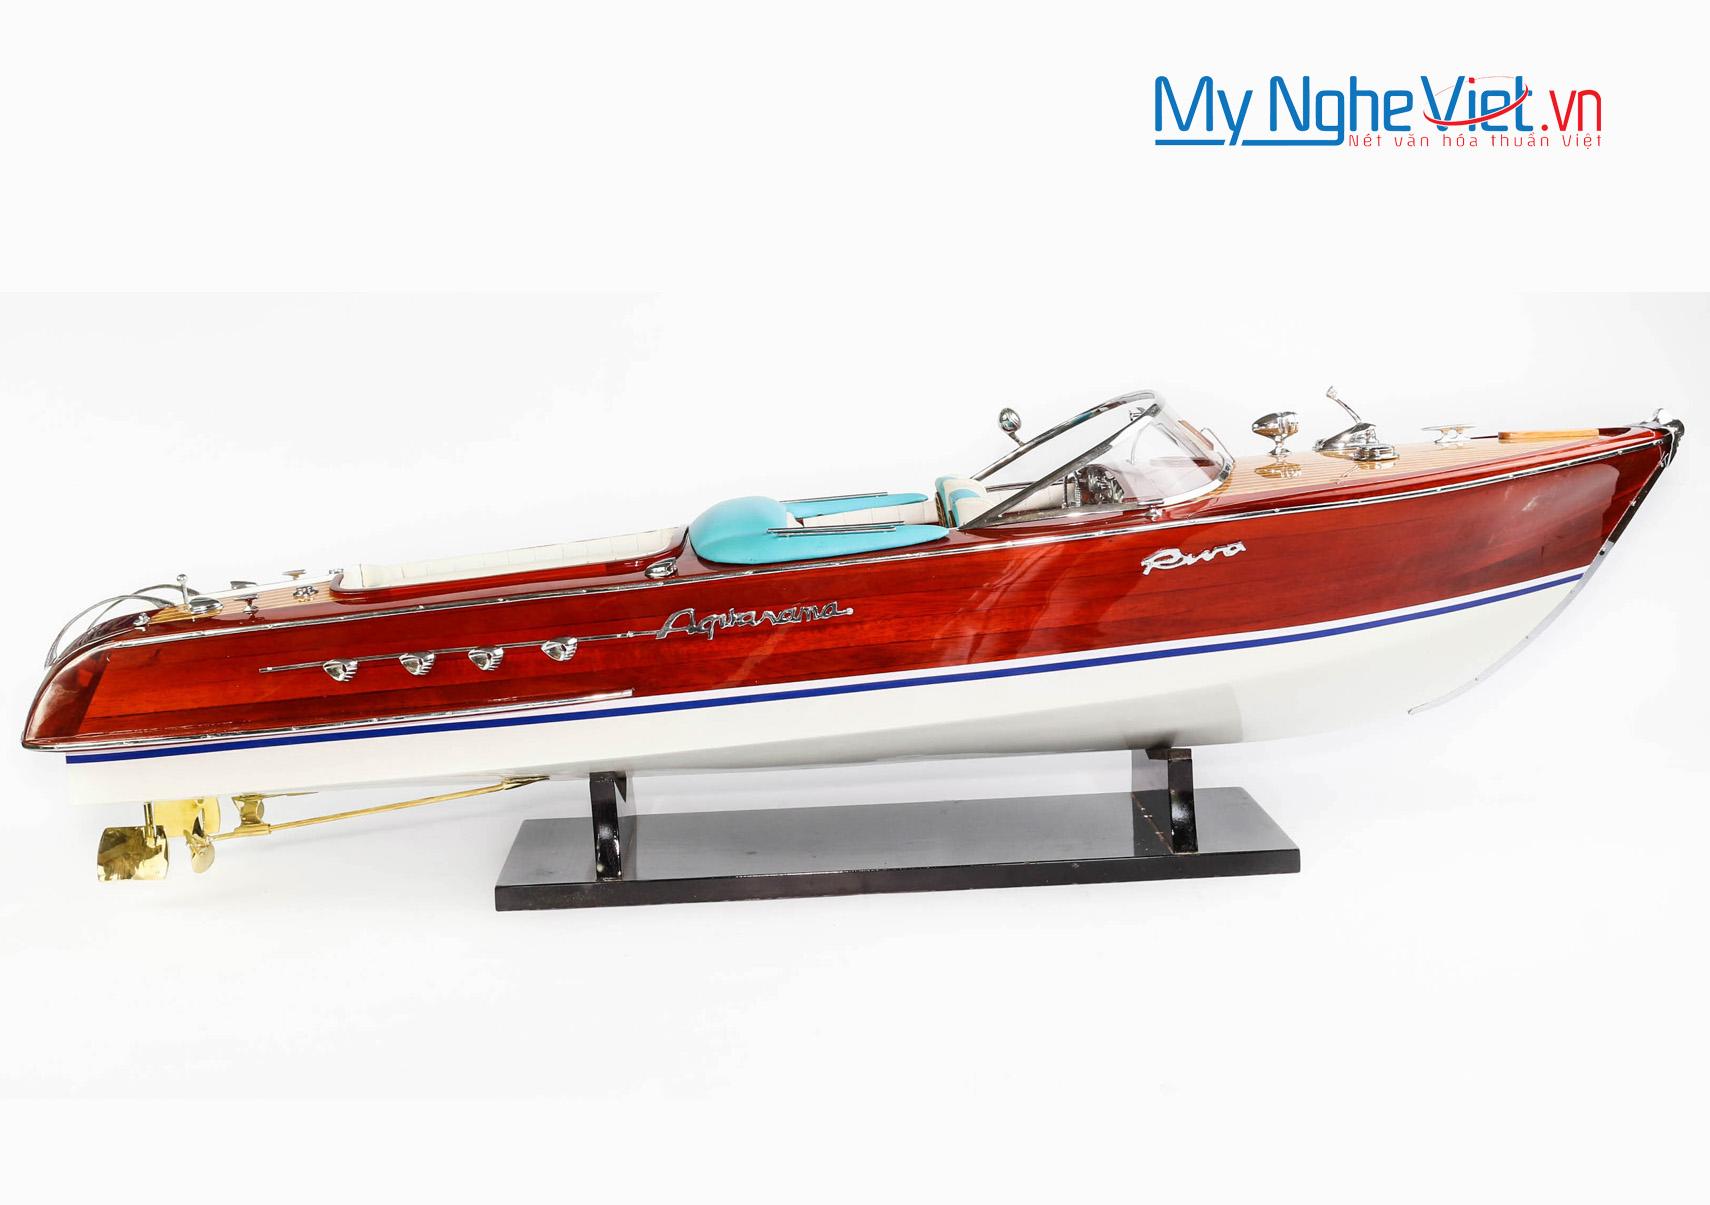 Model boat MNV-TB13